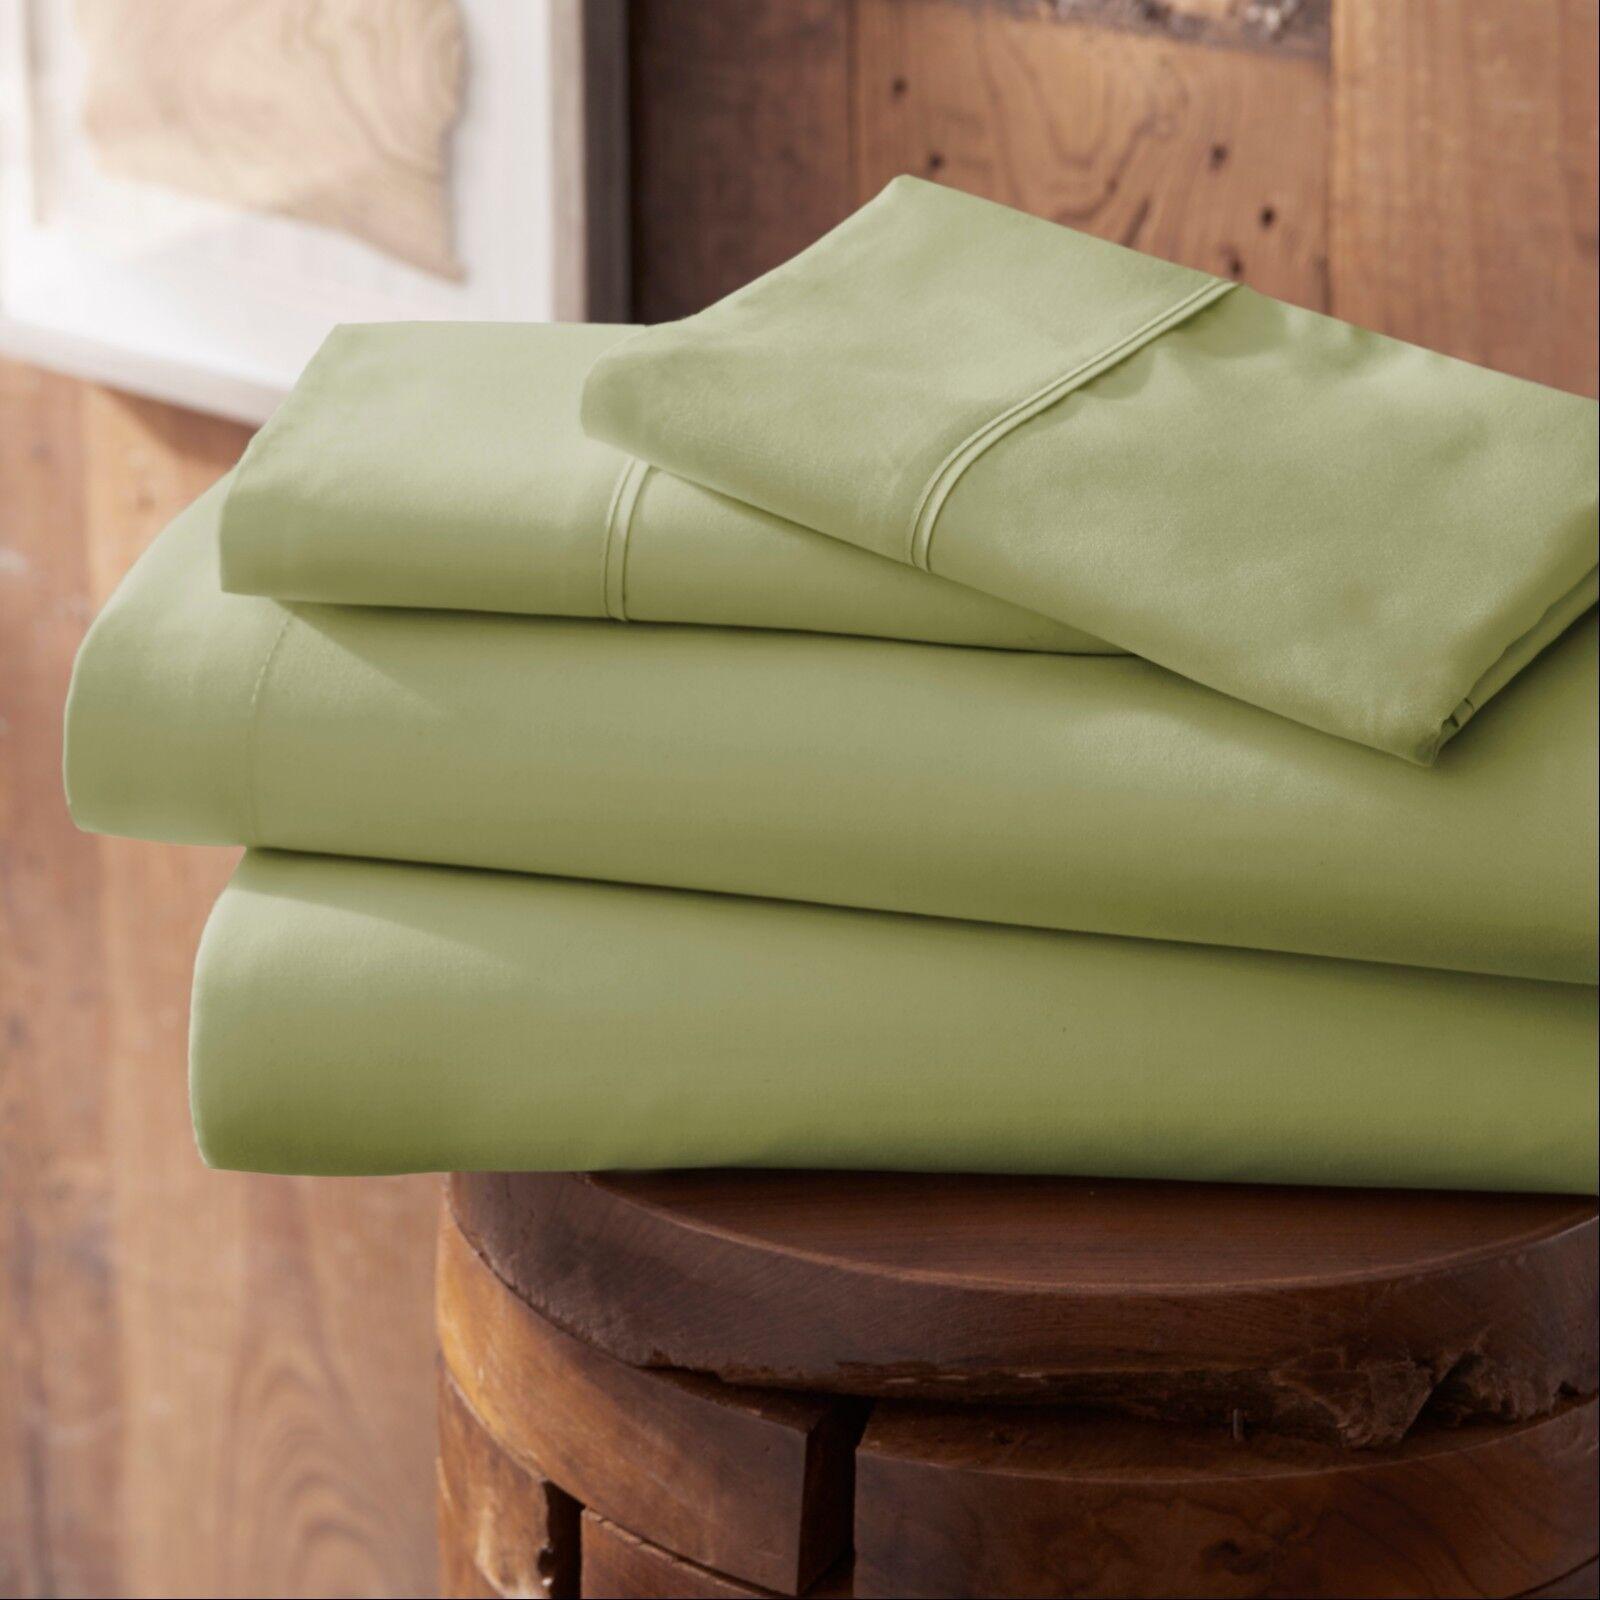 Egyptian Comfort Hotel Luxury 4 Piece Deep Pocket Bed Sheet Set